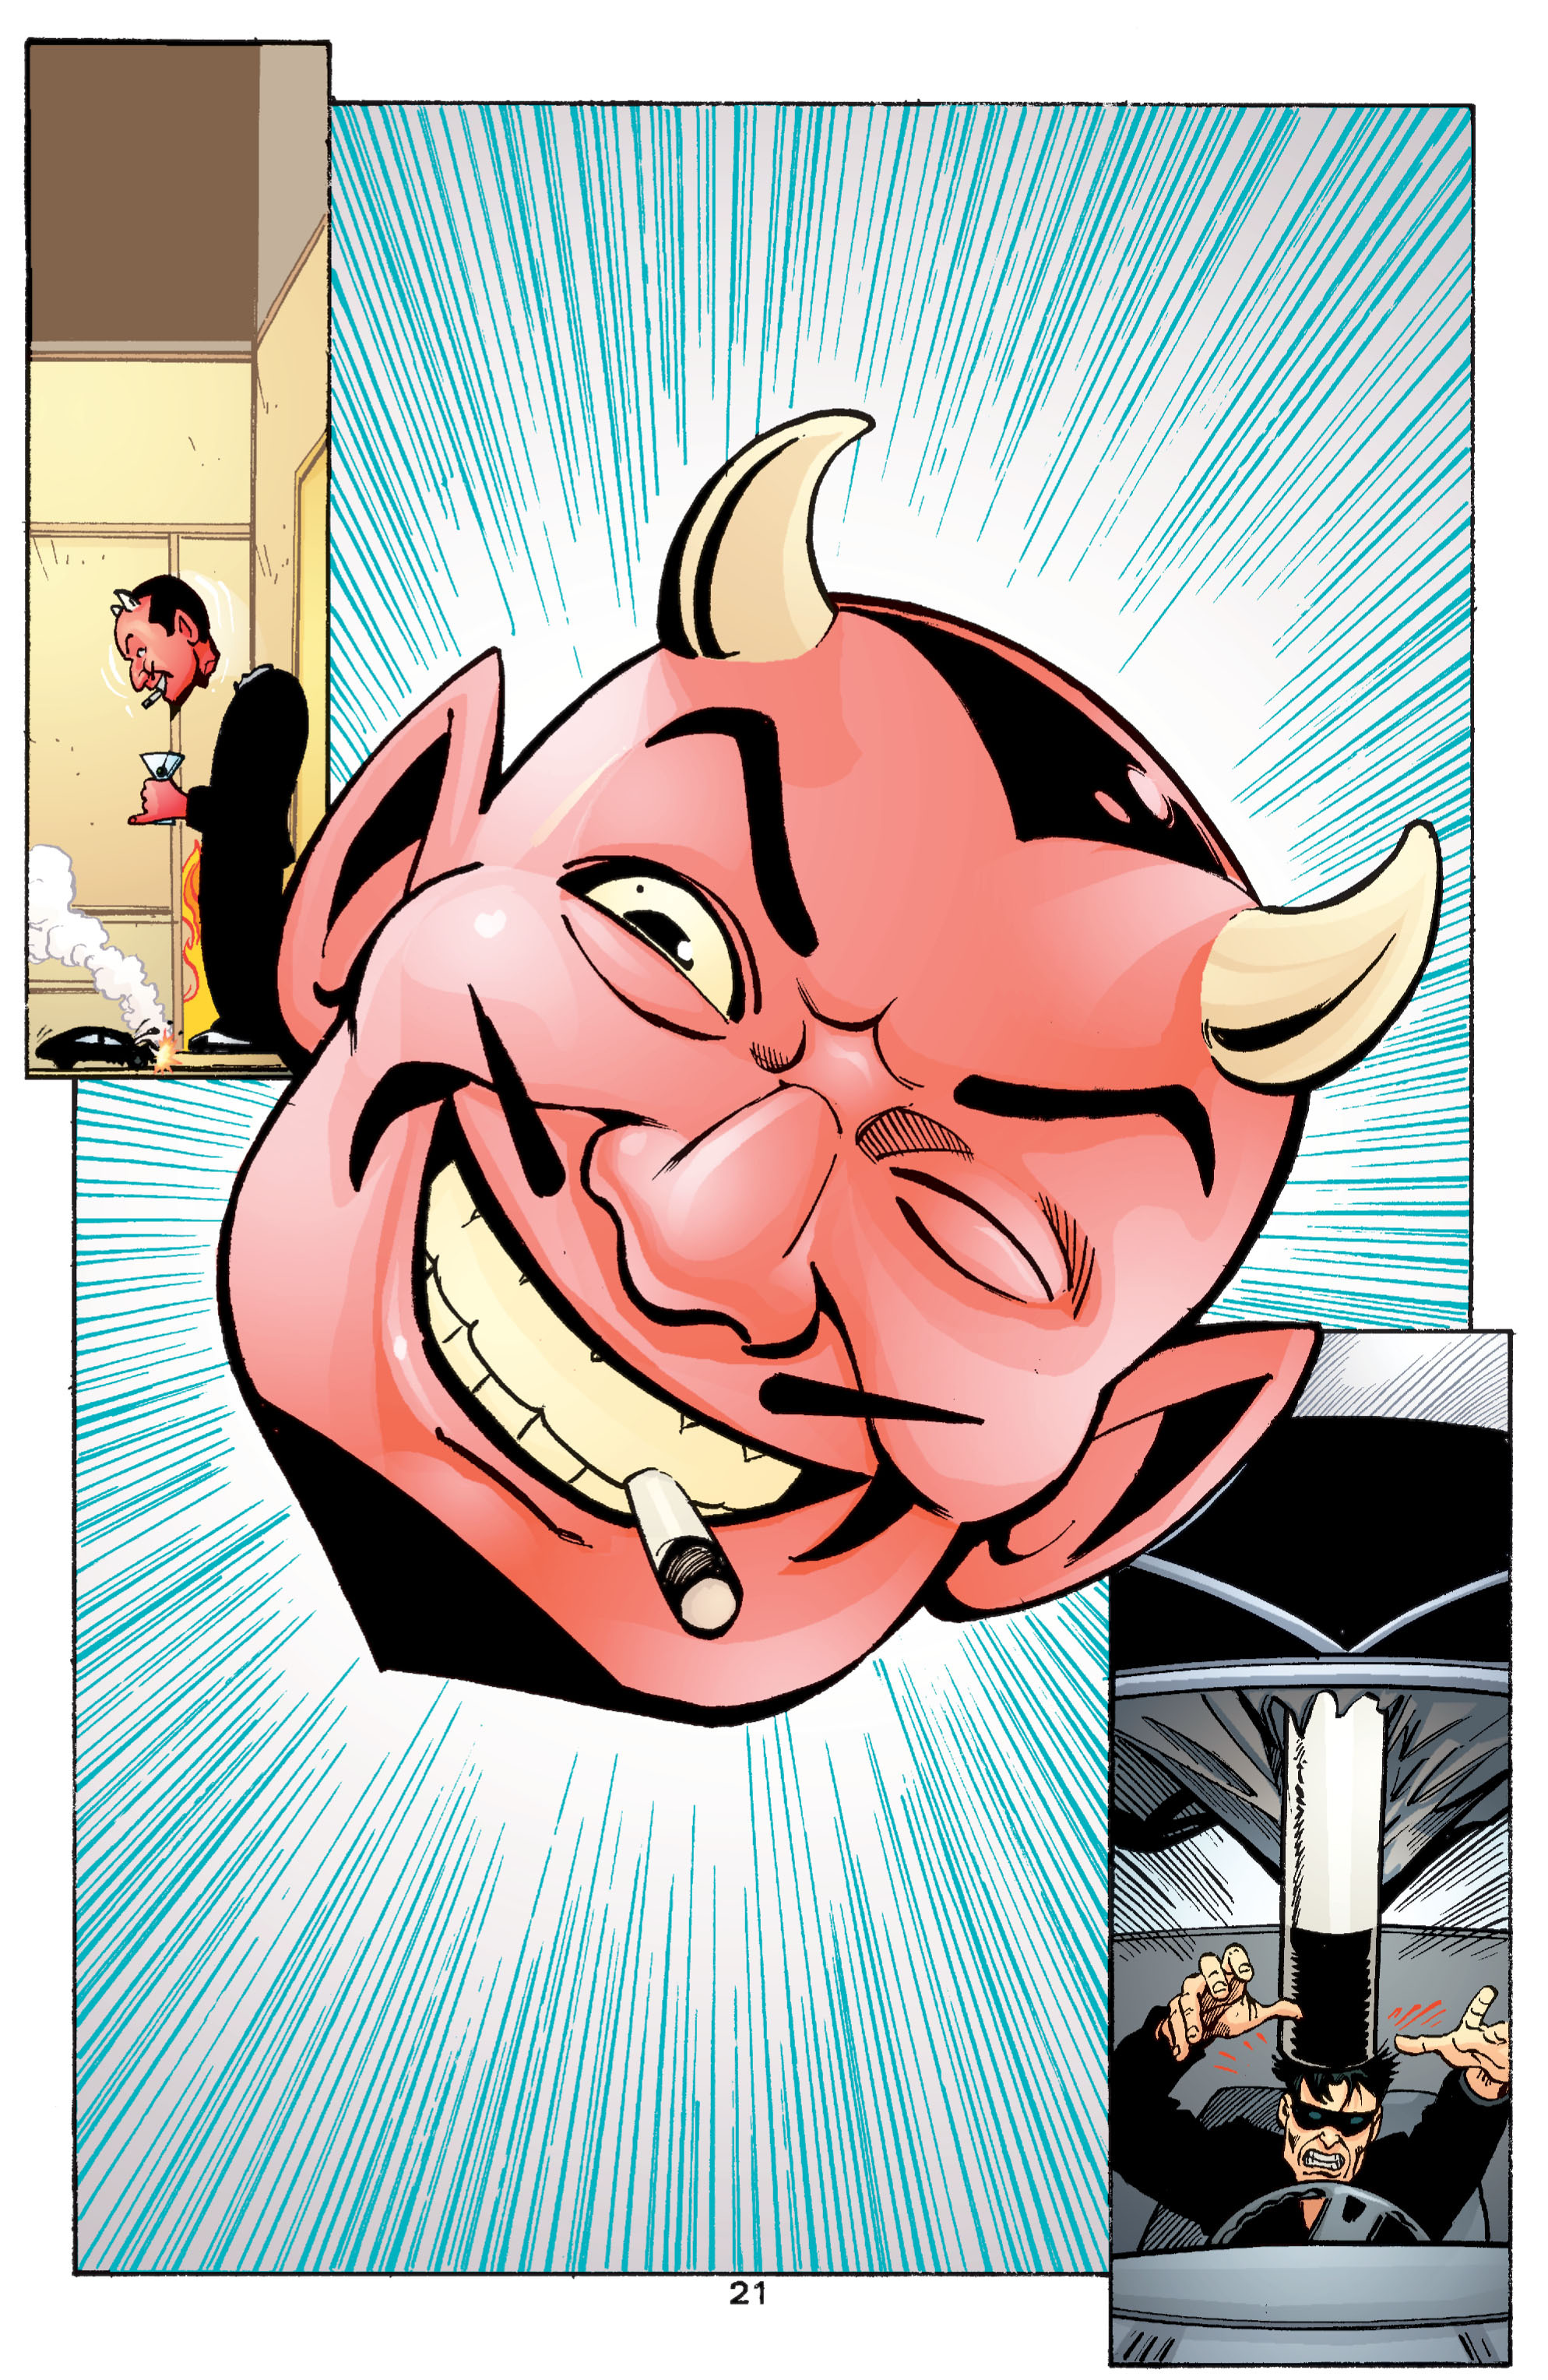 Read online Transmetropolitan comic -  Issue #55 - 22